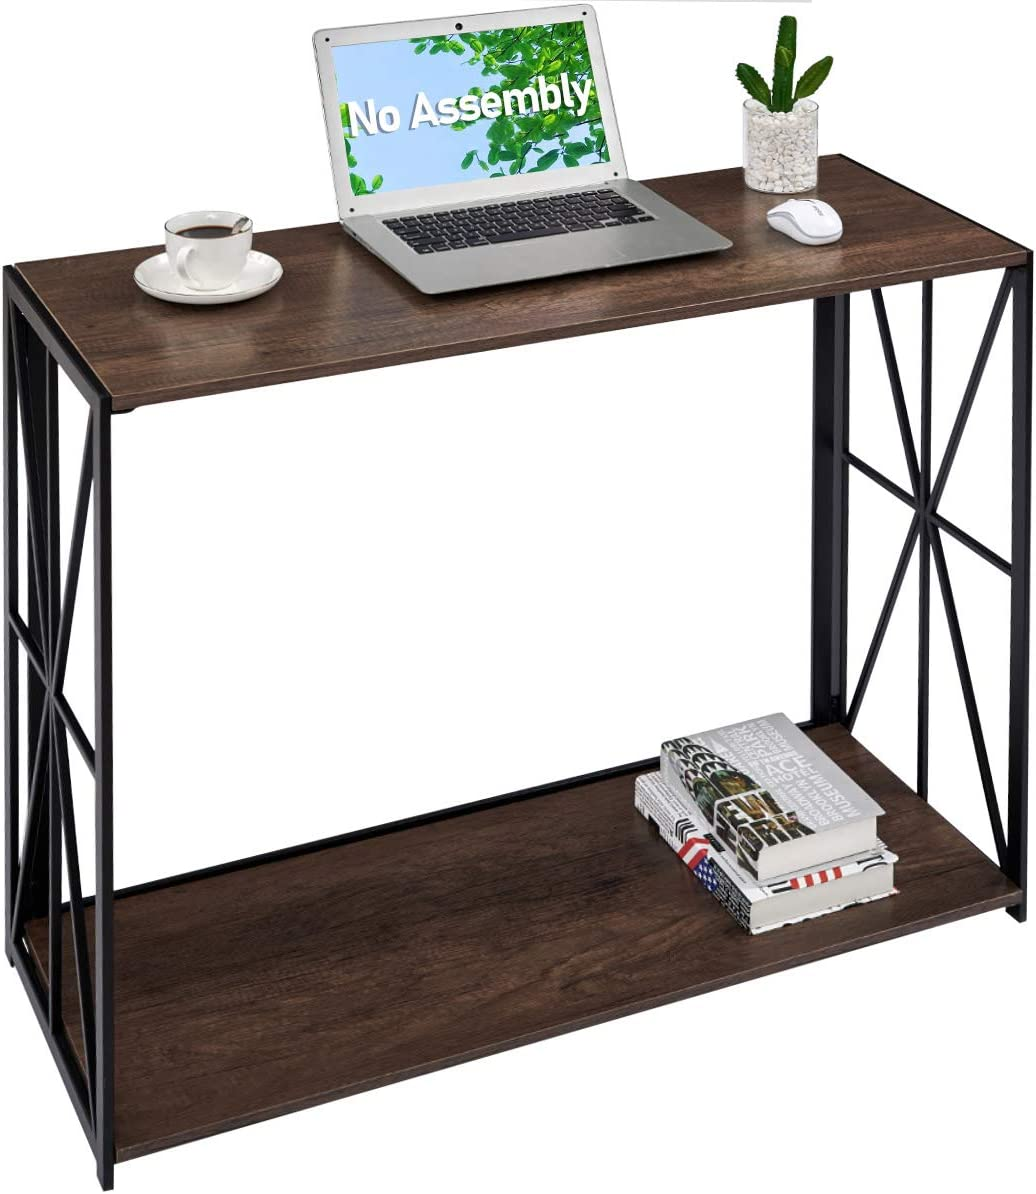 Folding Console Sofa Table 2 Tier Folding Wall Table